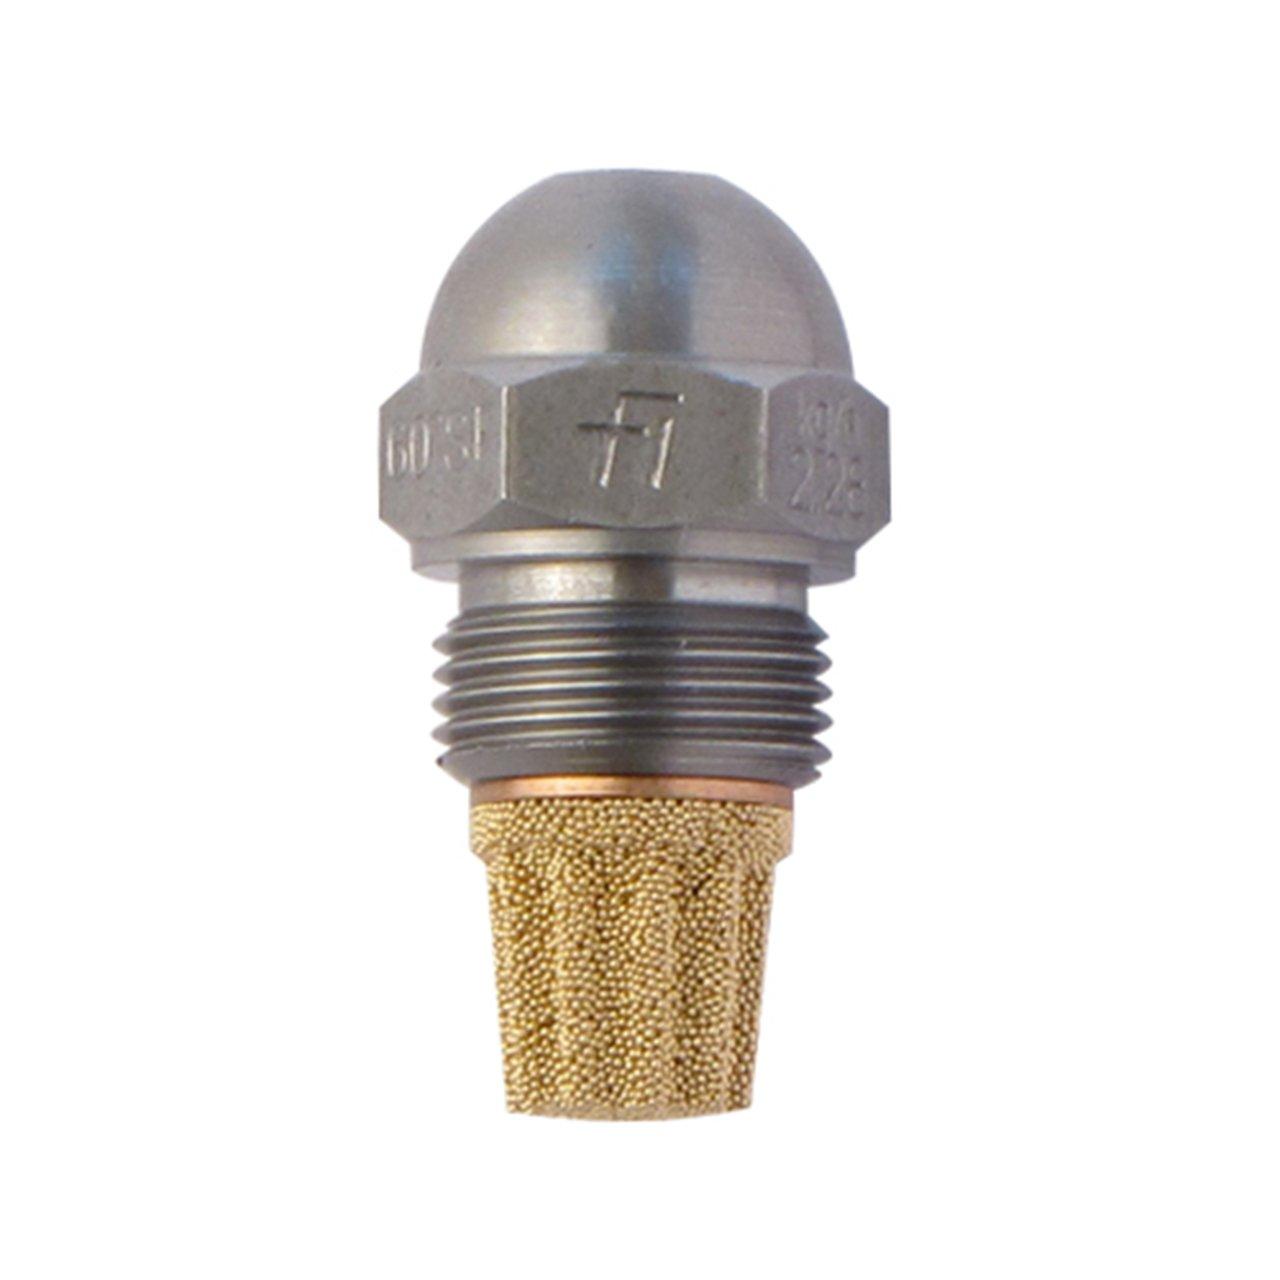 60°  HF  Ölbrennerdüse 1 Stück Fluidics Öldüse 0,65  GAL// H